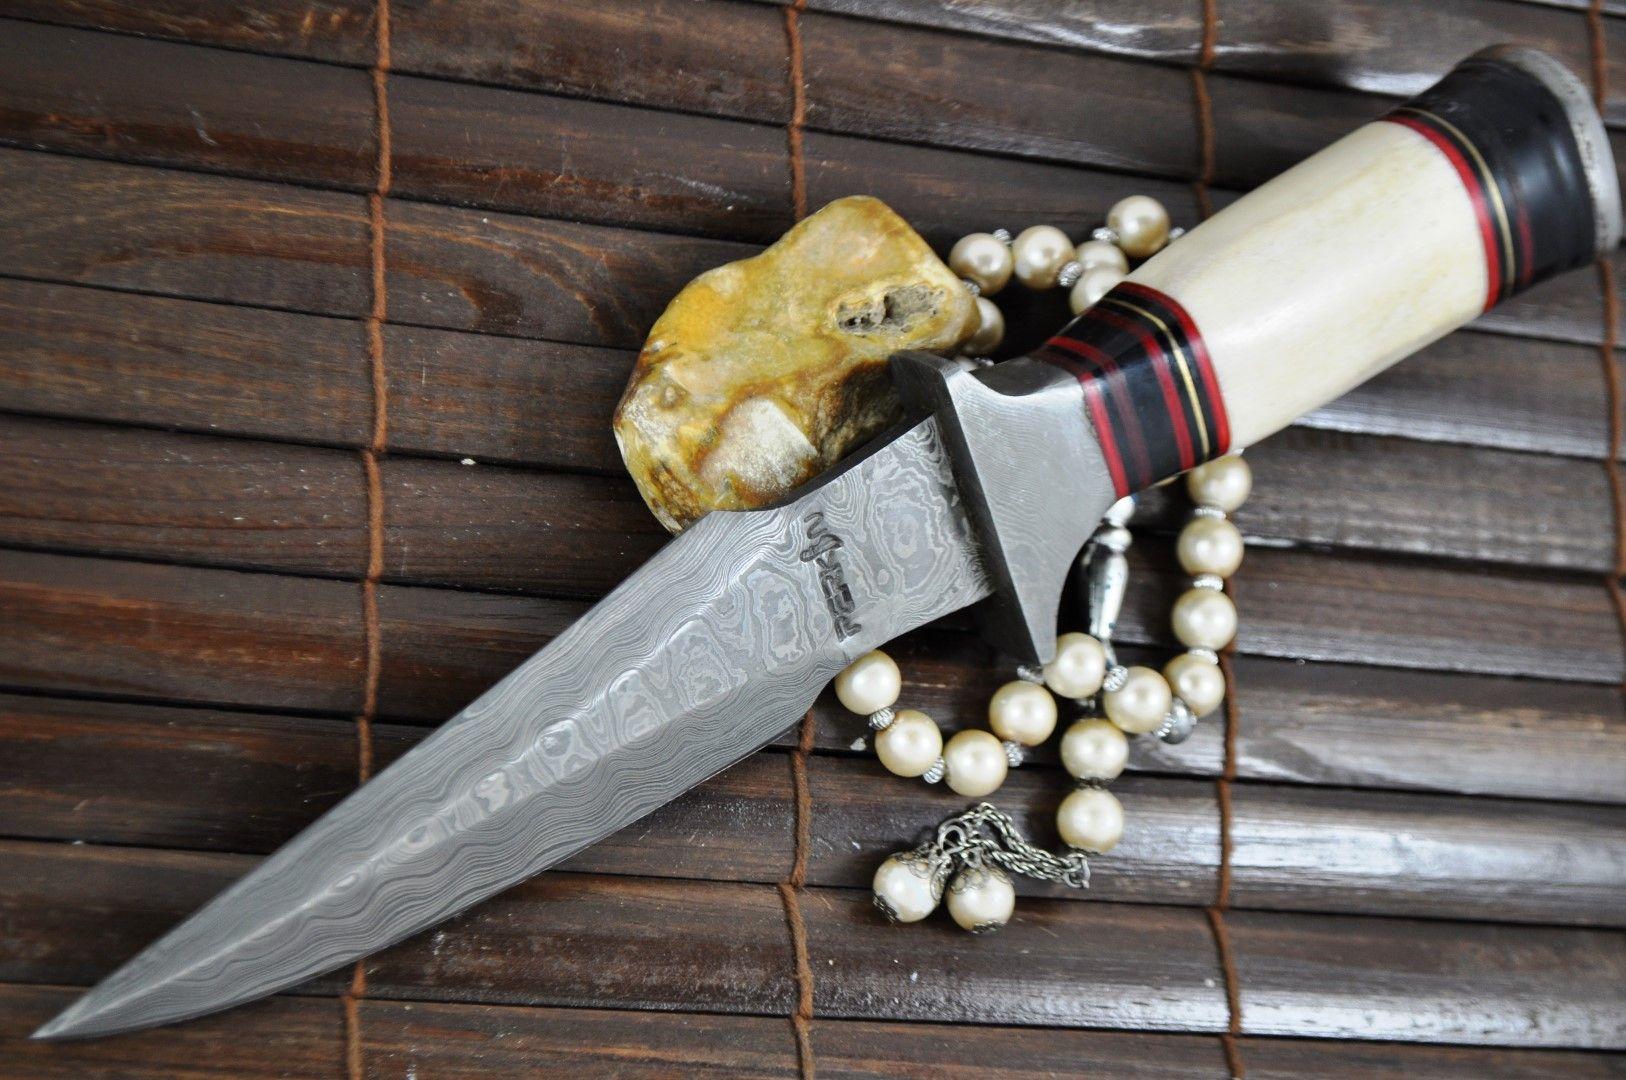 Handmade Damascus Hunting Knife With Bone Amp Wood Handle